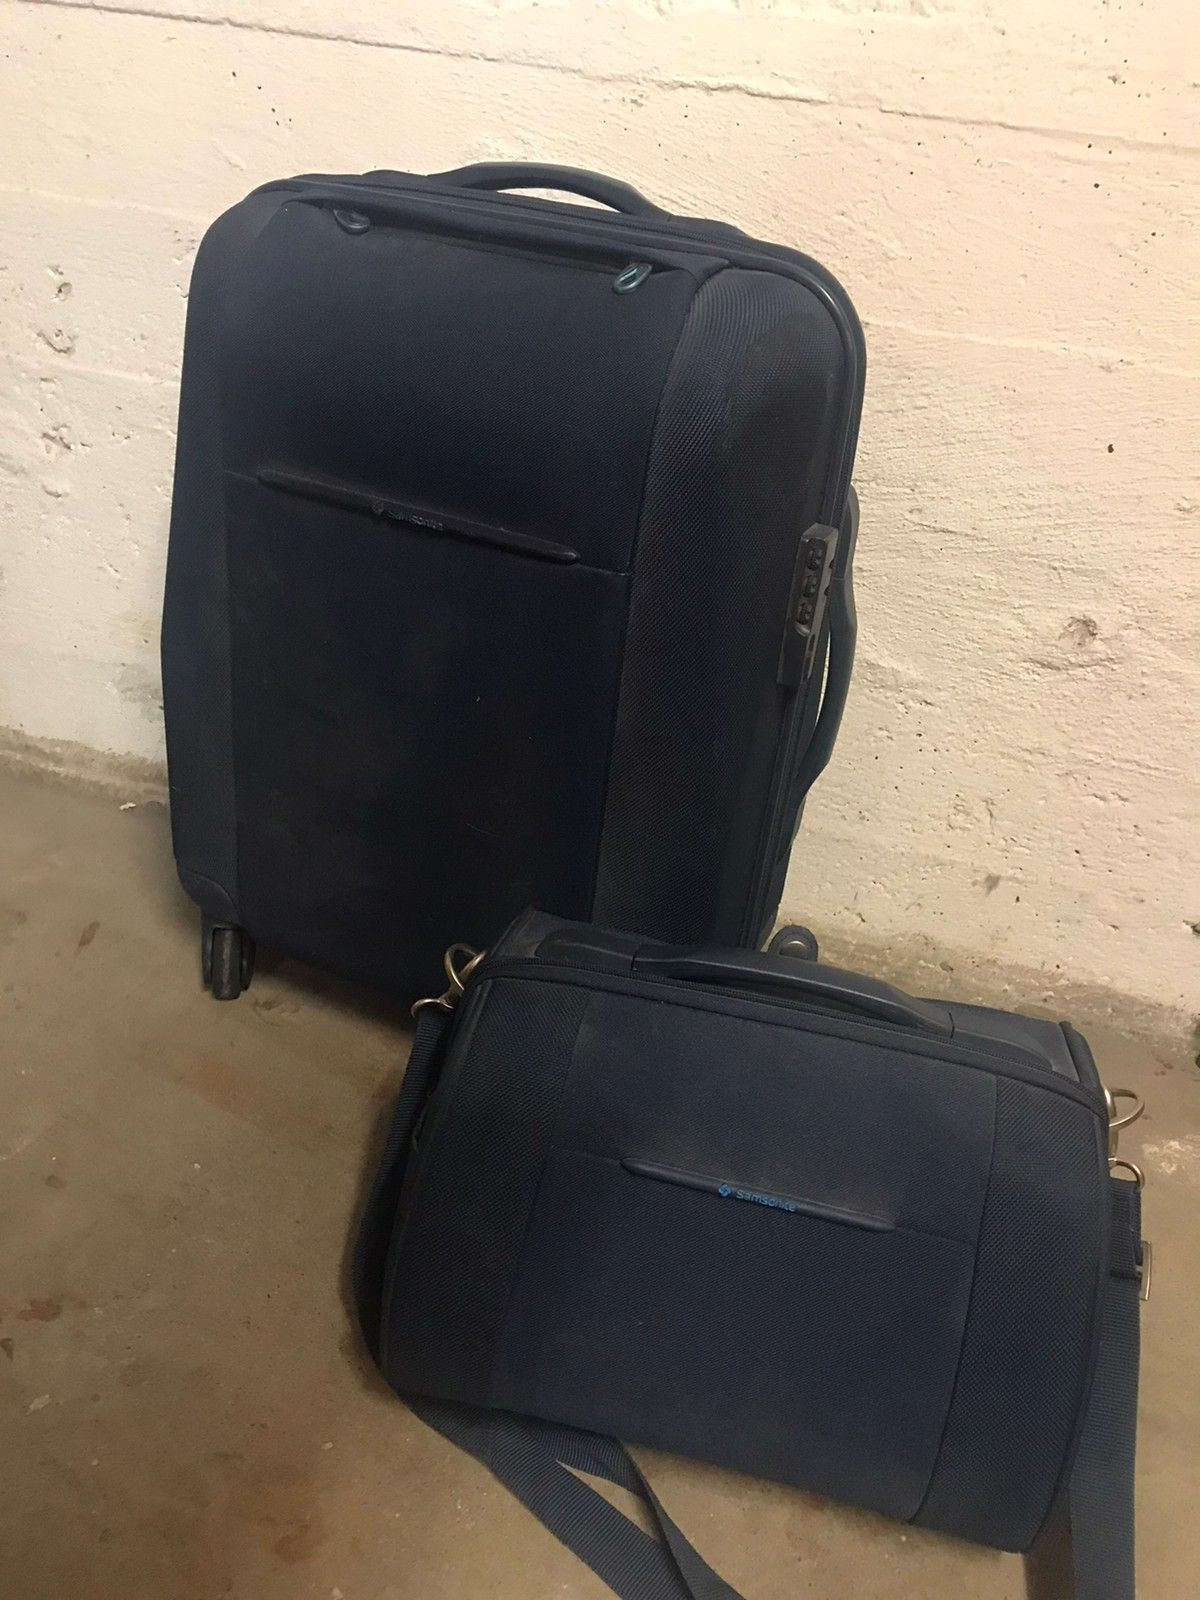 Samsonite koffert selges | FINN.no